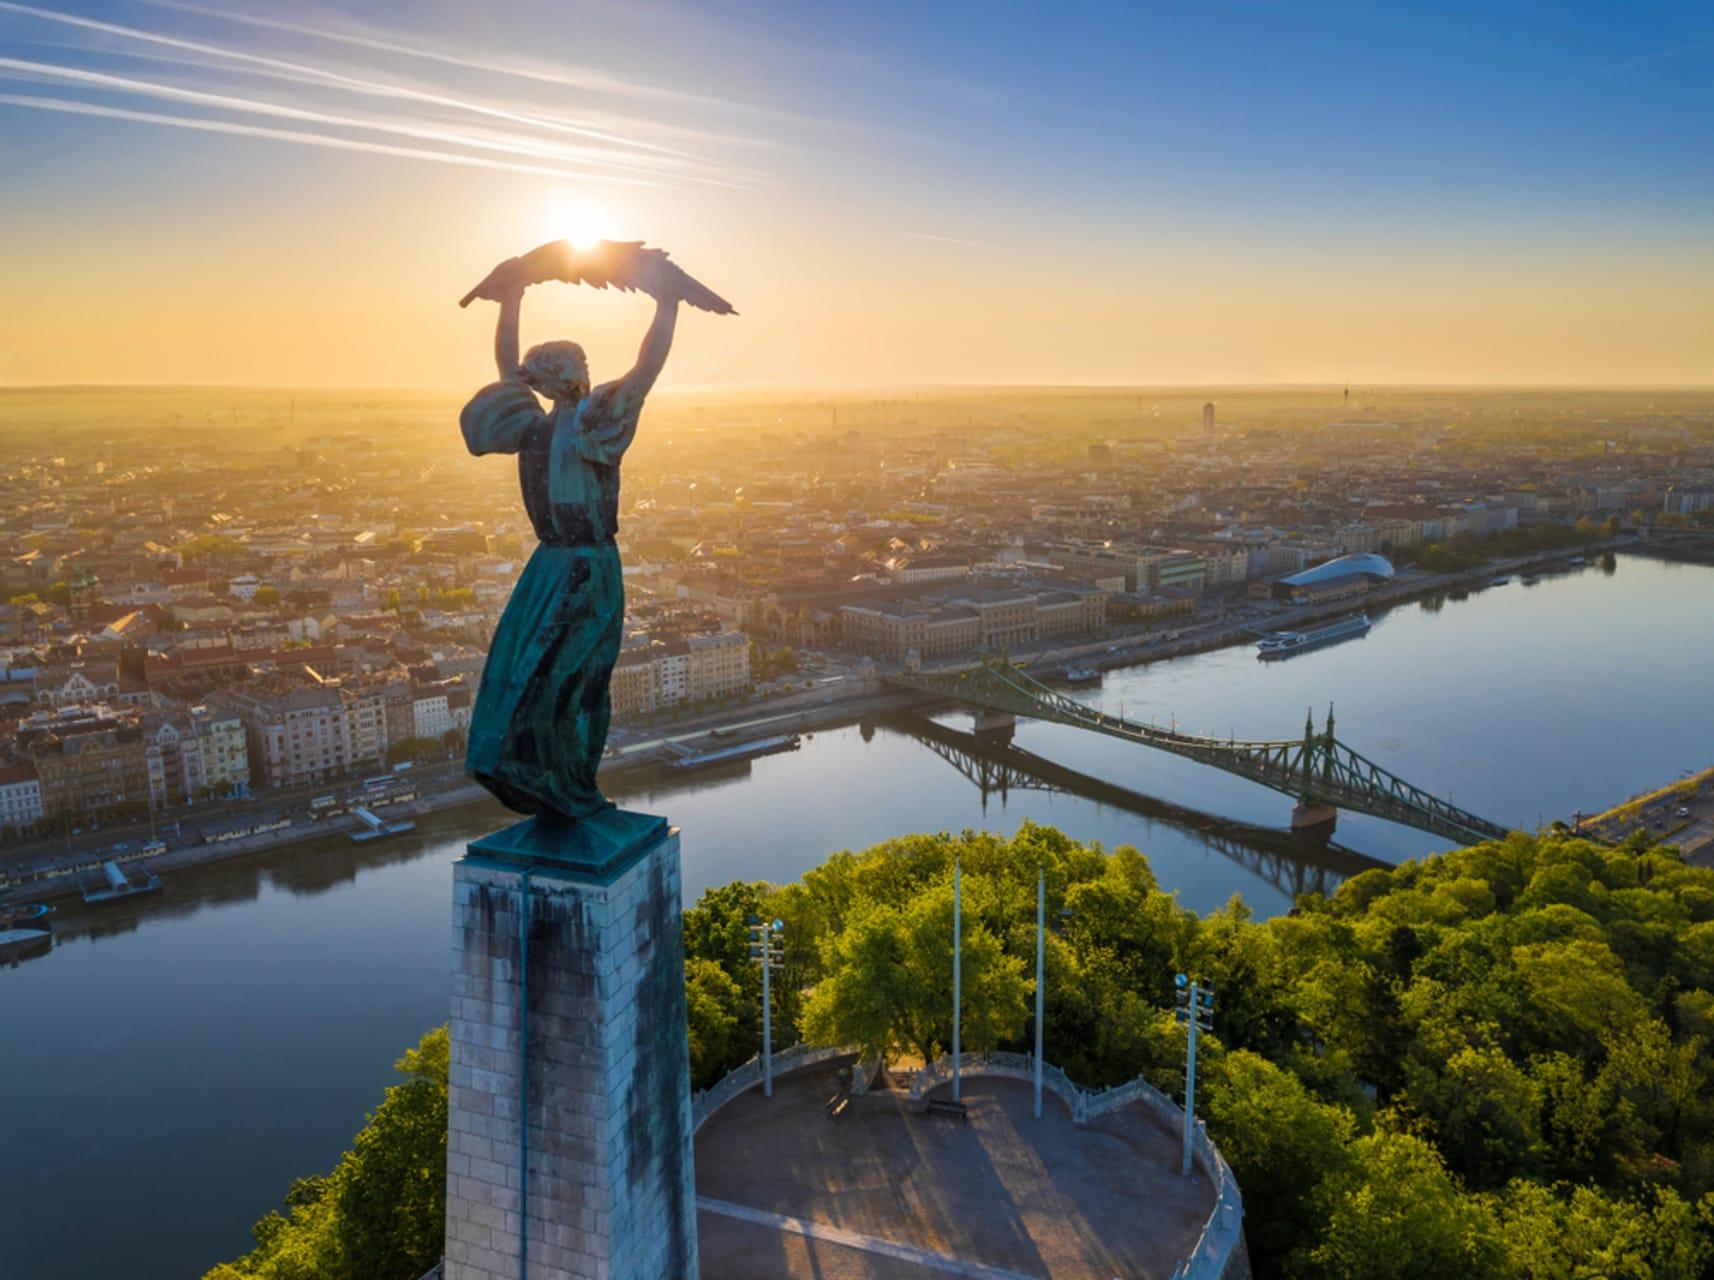 Budapest - A walk on Gellért Hill- Citadel- Experience Budapest from Above